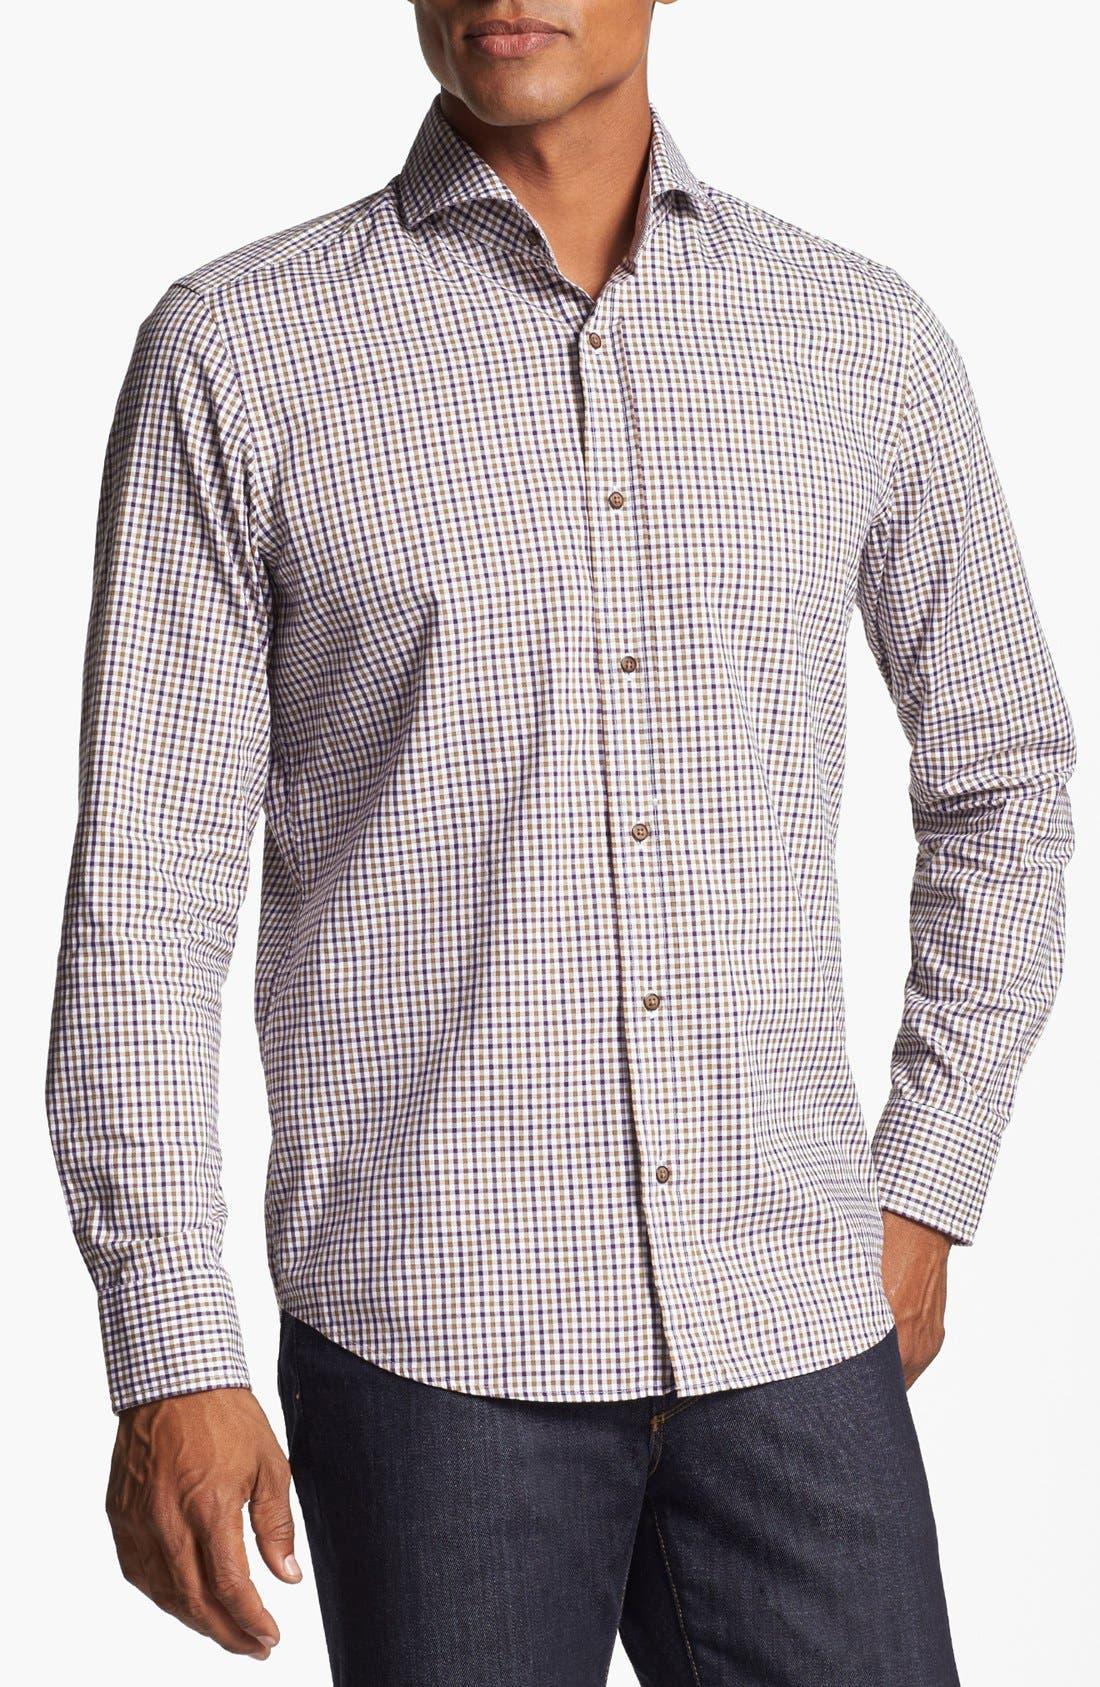 Alternate Image 1 Selected - BOSS HUGO BOSS 'Sean' Regular Fit Sport Shirt